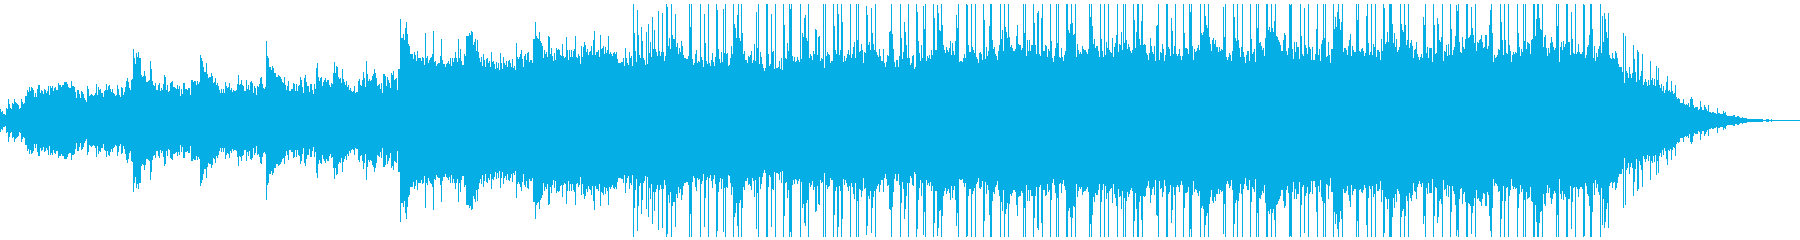 twilightの再生済みの波形